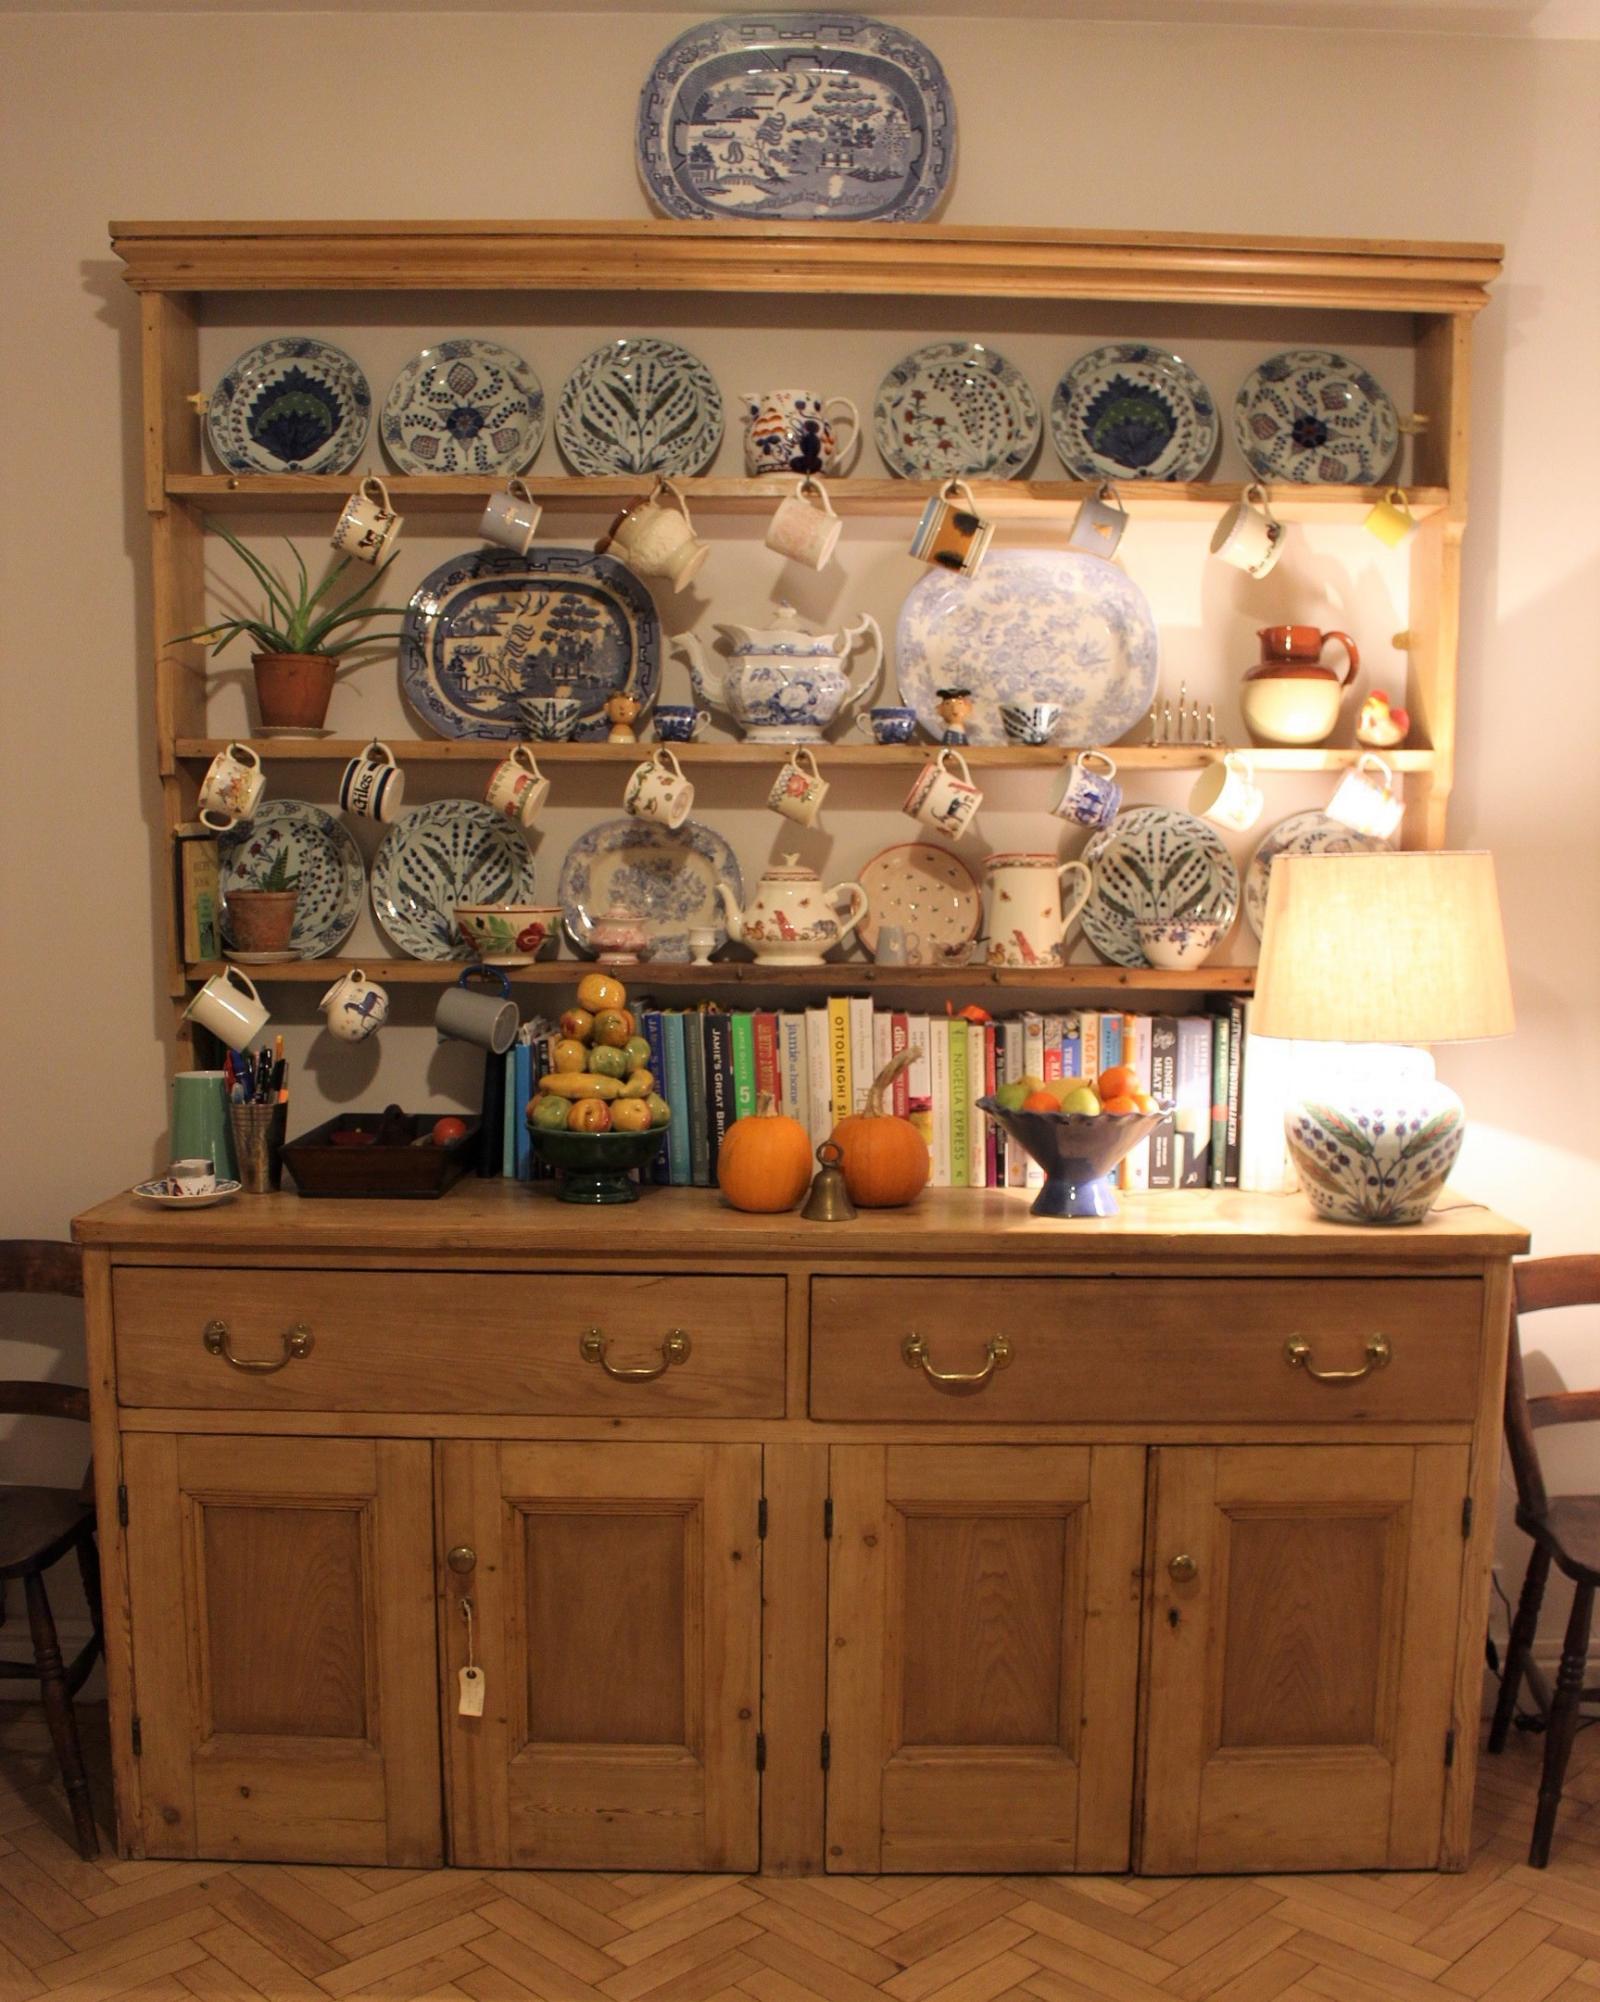 Kitchen Design Inspiration - our antique dresser